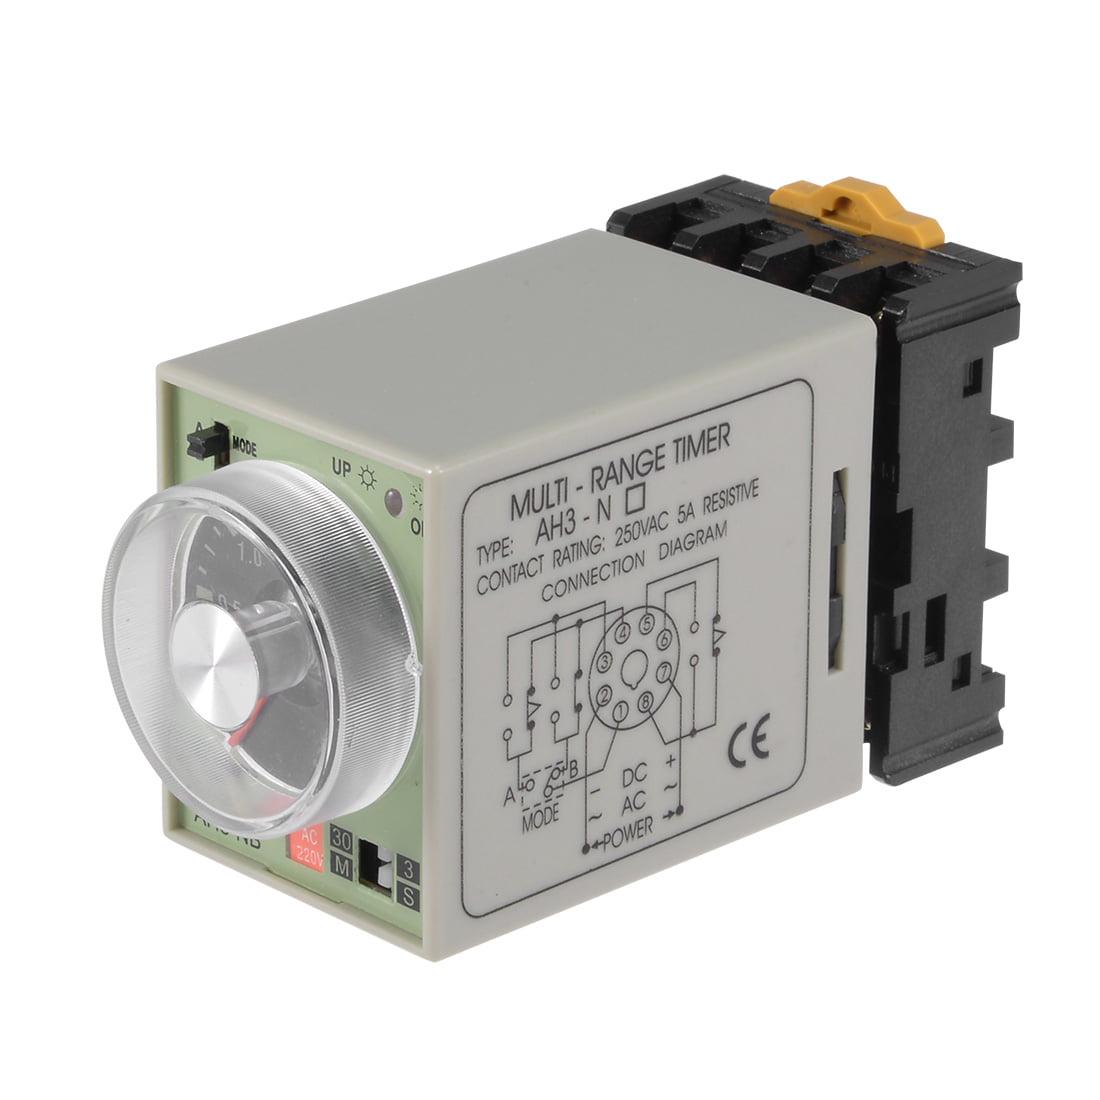 Ac220v 3s 30m 8 Terminals Range Adjustable Delay Timer Time Relay Wiring Diagram For Off On Lights Ah3 Nb W Base